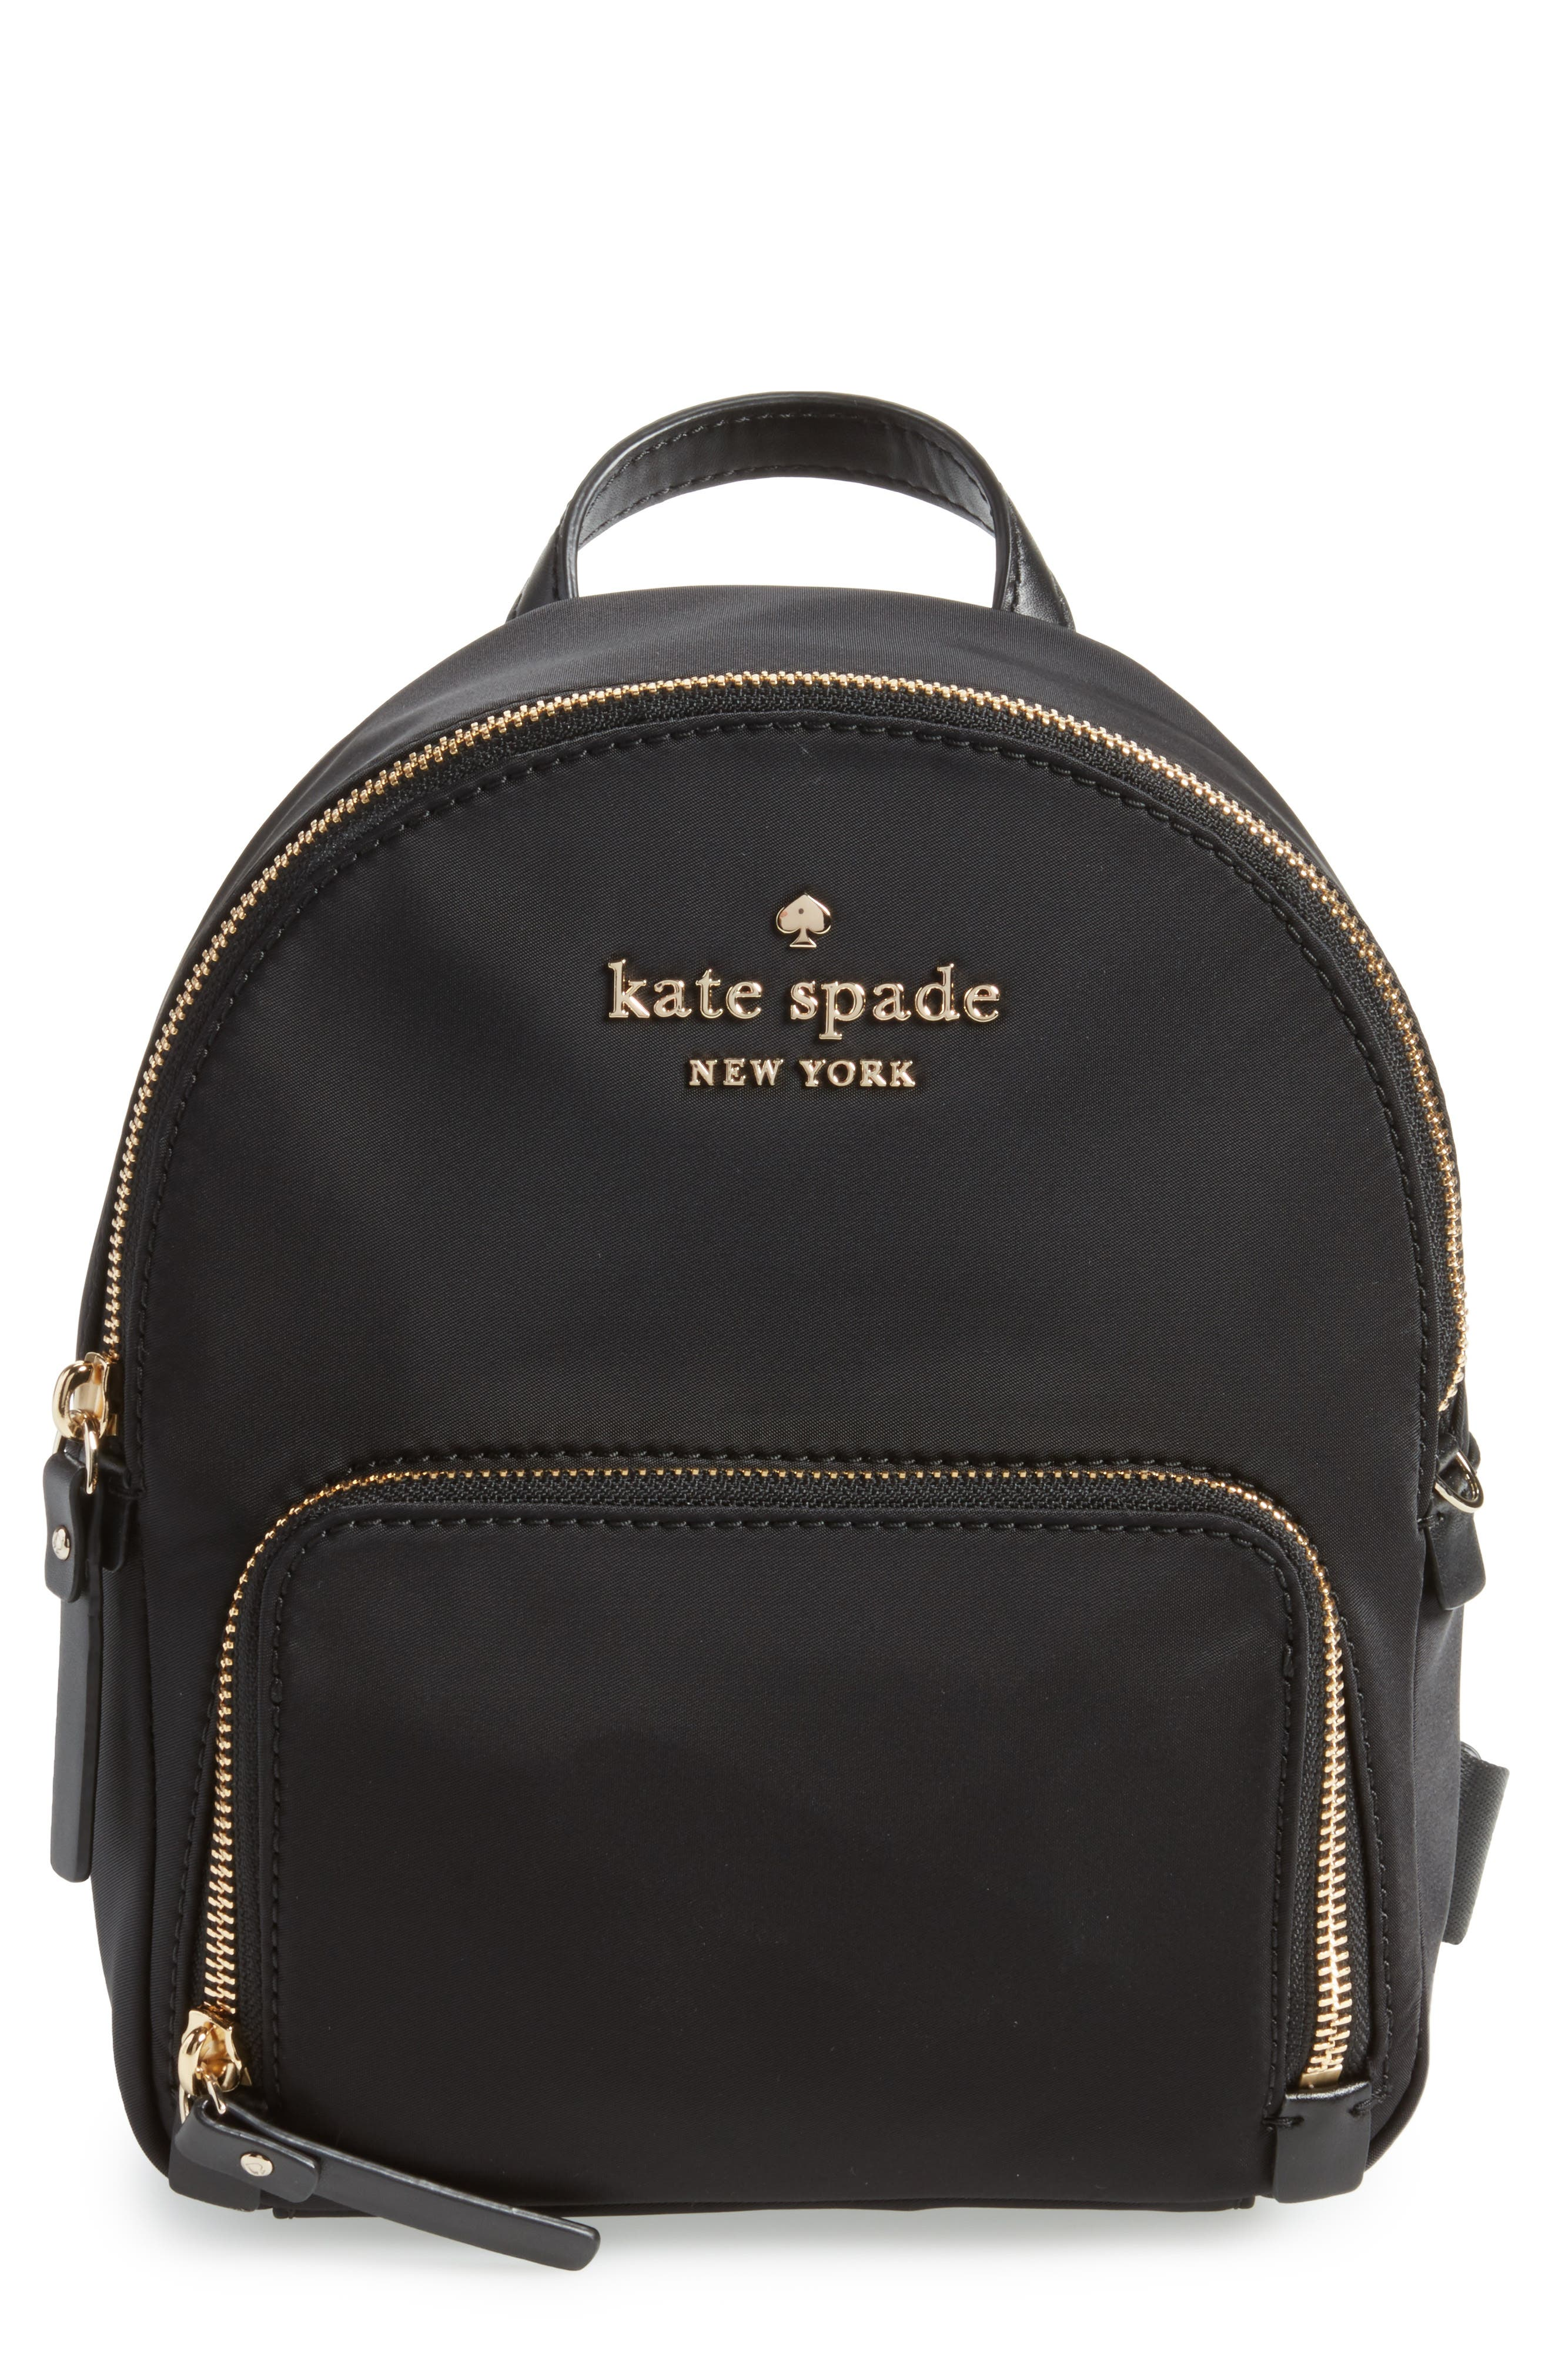 kate spade new york watson lane - small hartley nylon backpack